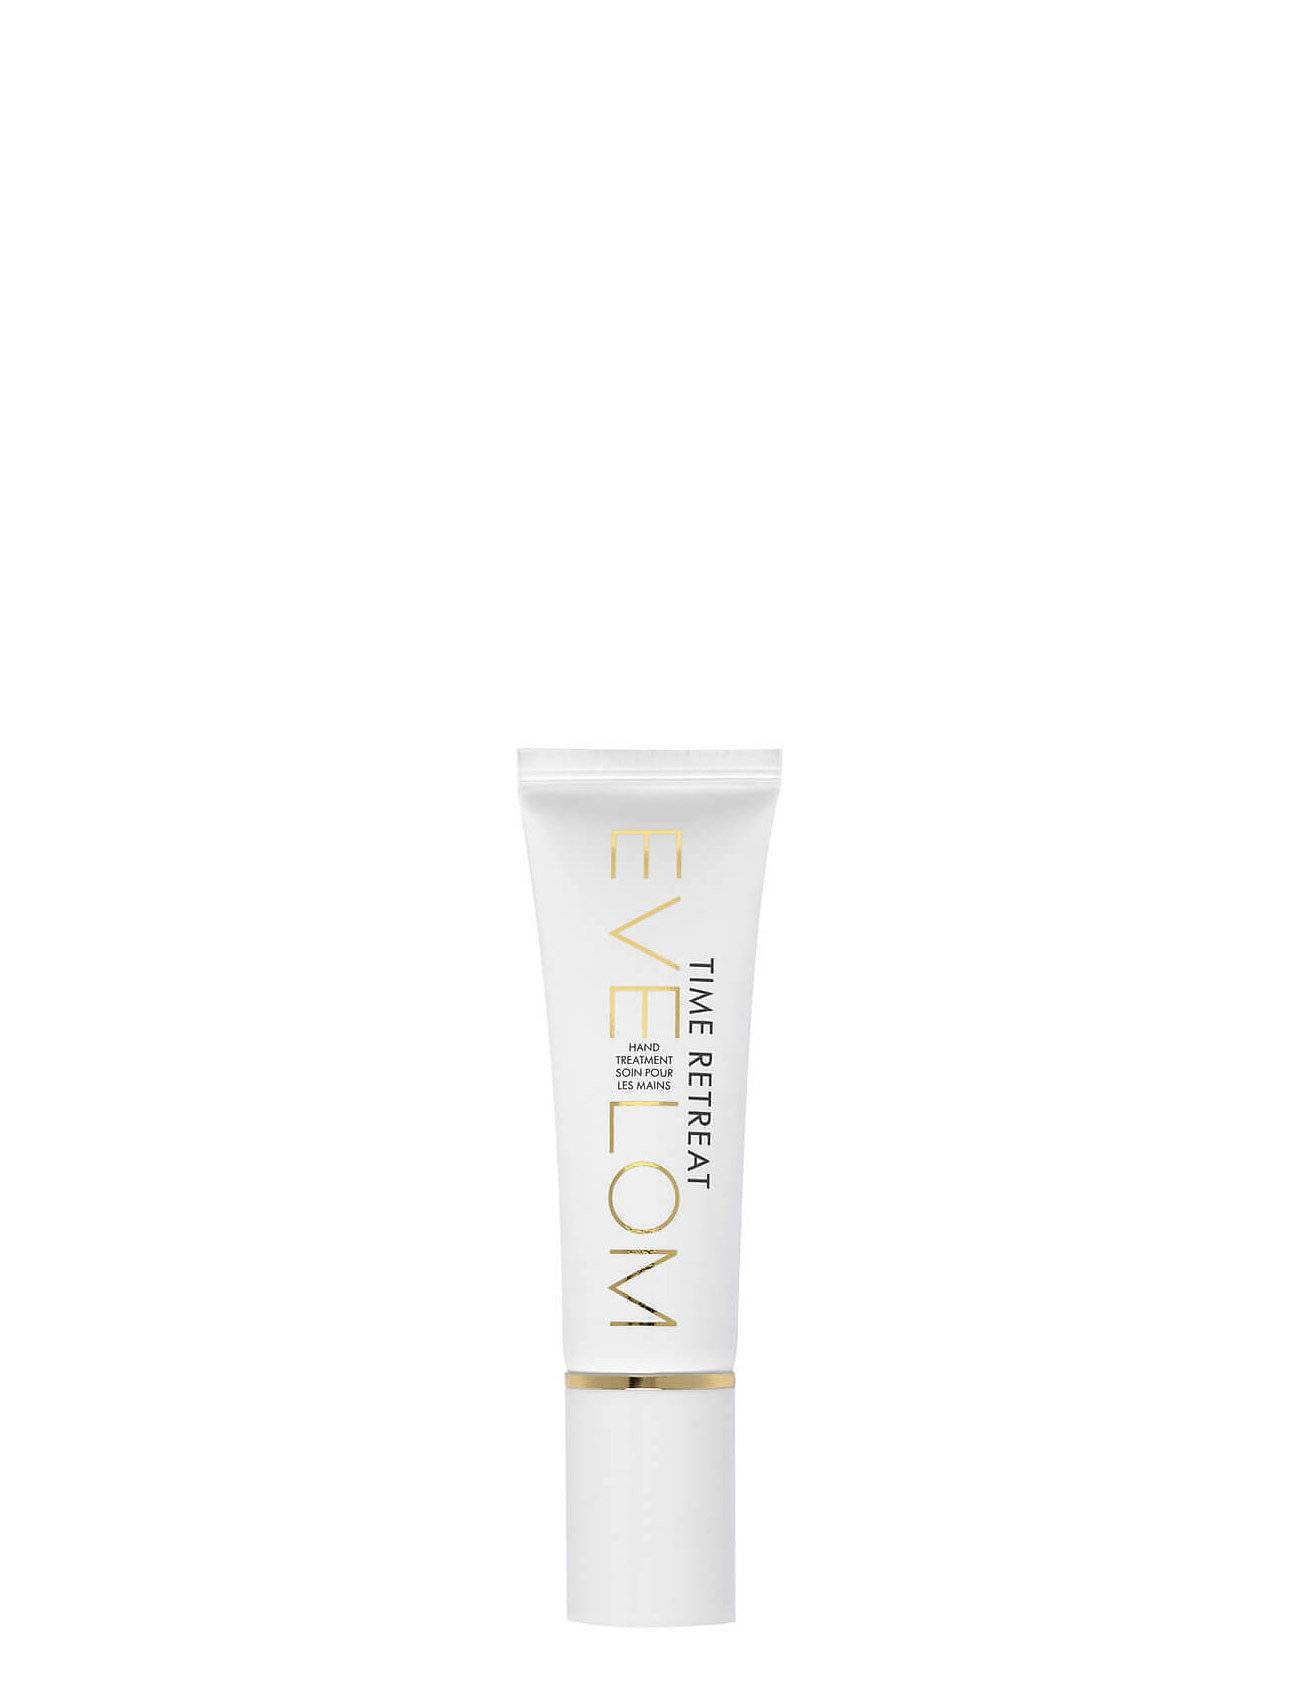 EVE LOM Time Retreat Hand Treatment Beauty WOMEN Skin Care Face Hand Cream & Foot Cream Nude